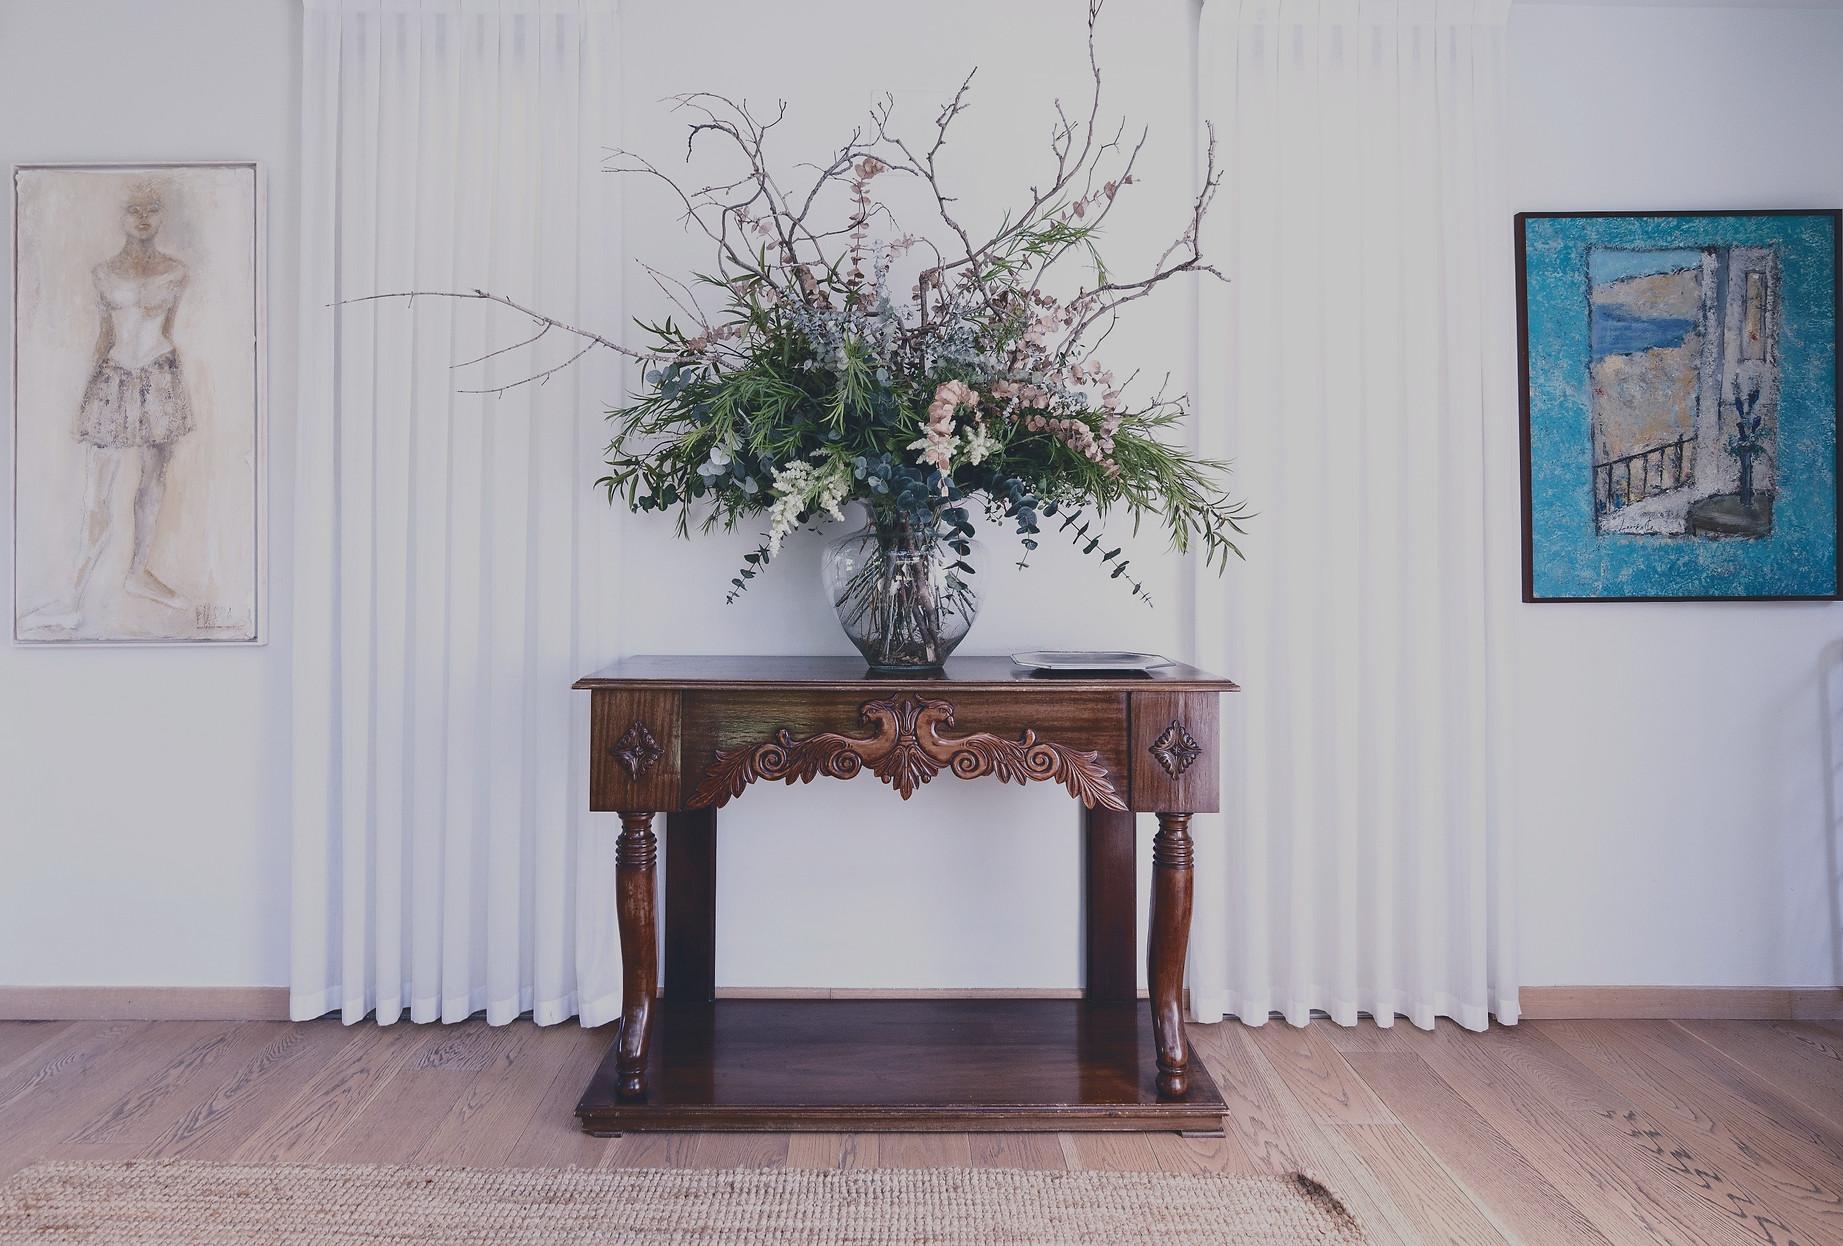 restored brown ornate table